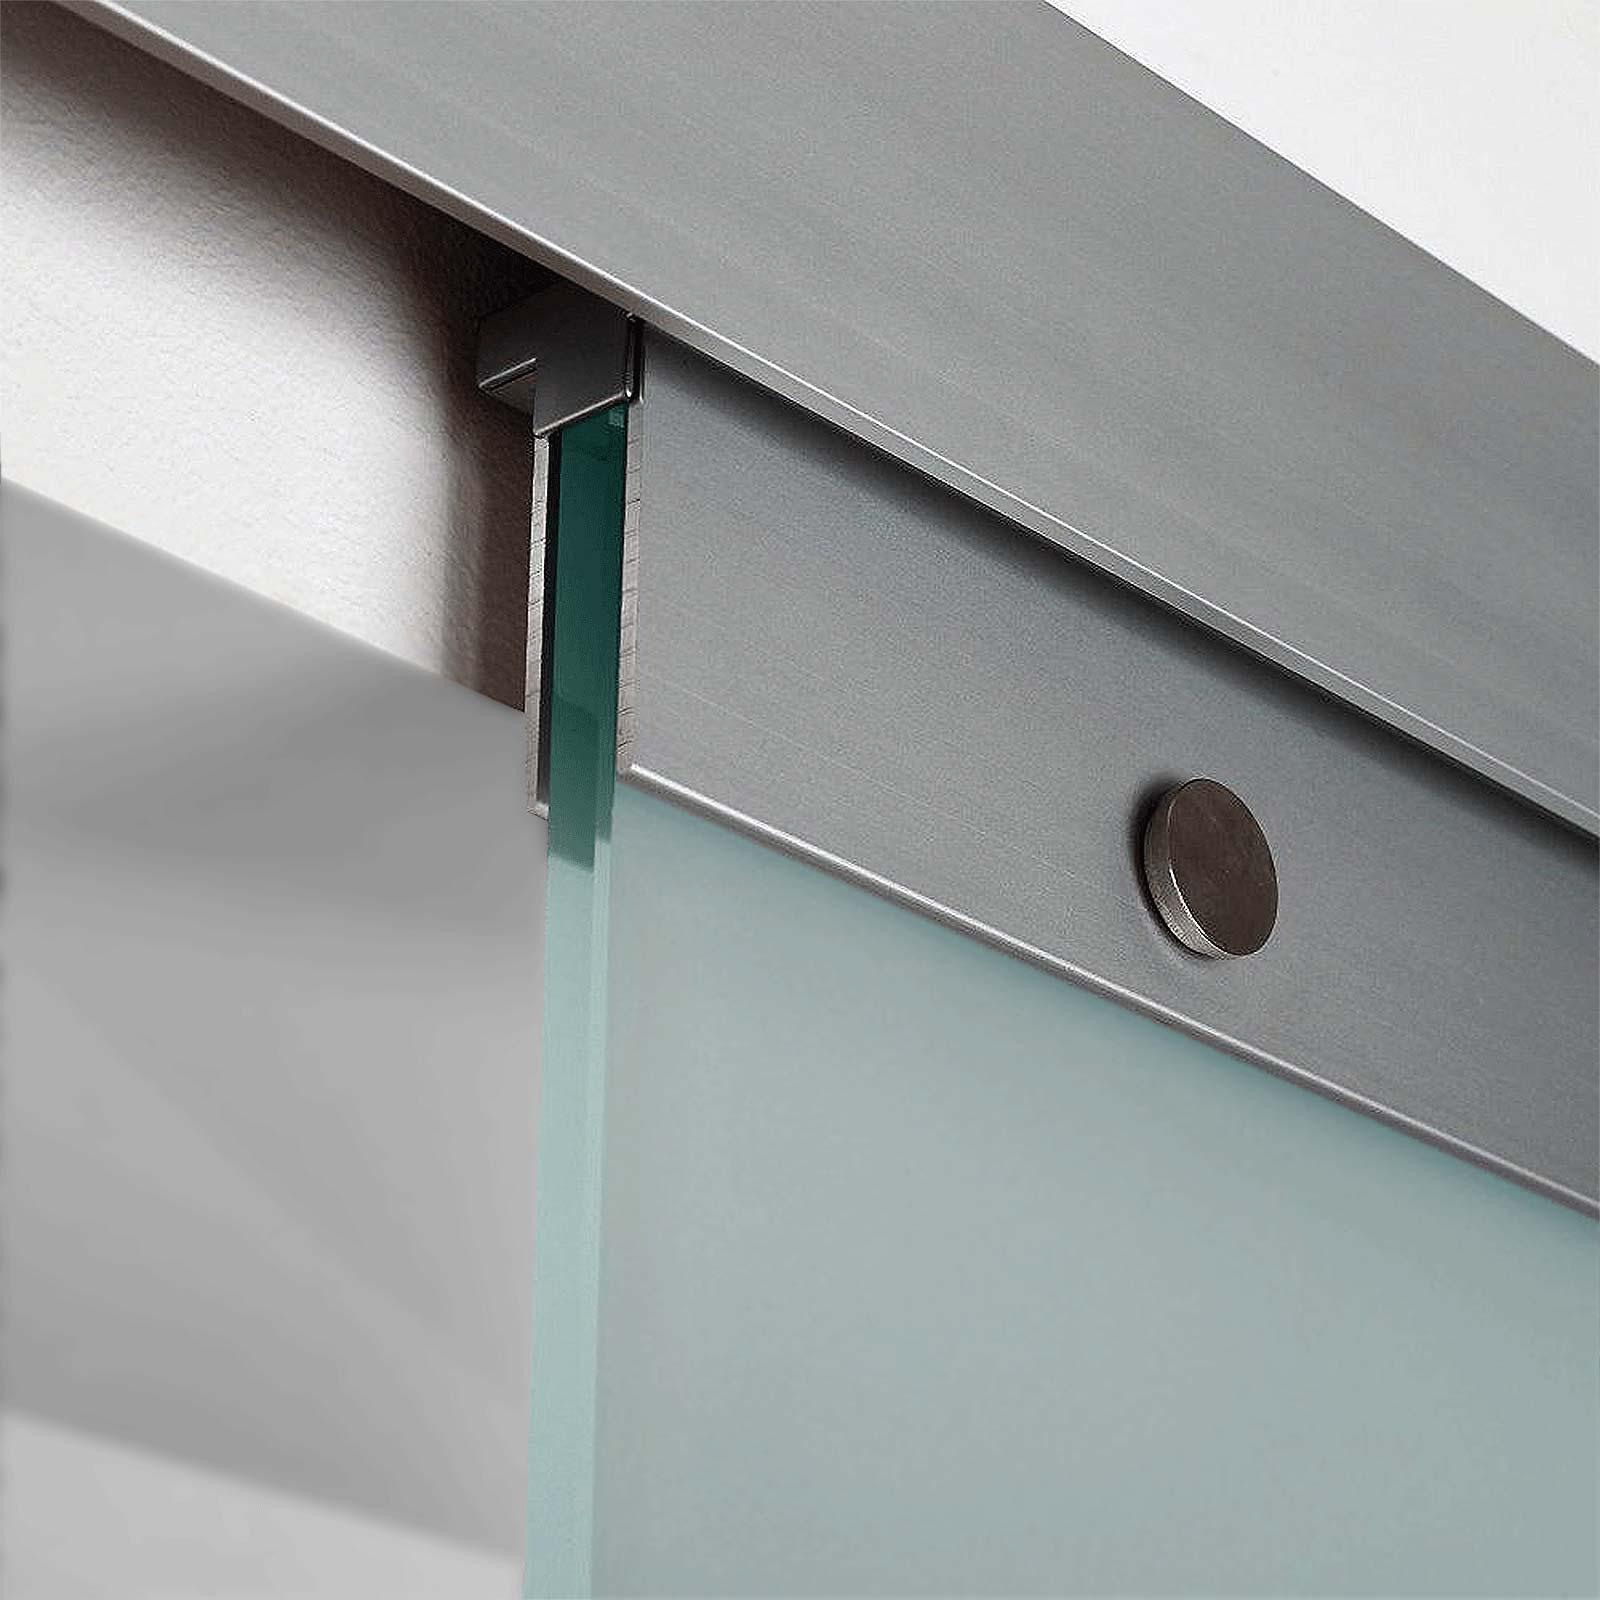 glasschiebet r schiebet r 880x2035 beschlag softclose. Black Bedroom Furniture Sets. Home Design Ideas